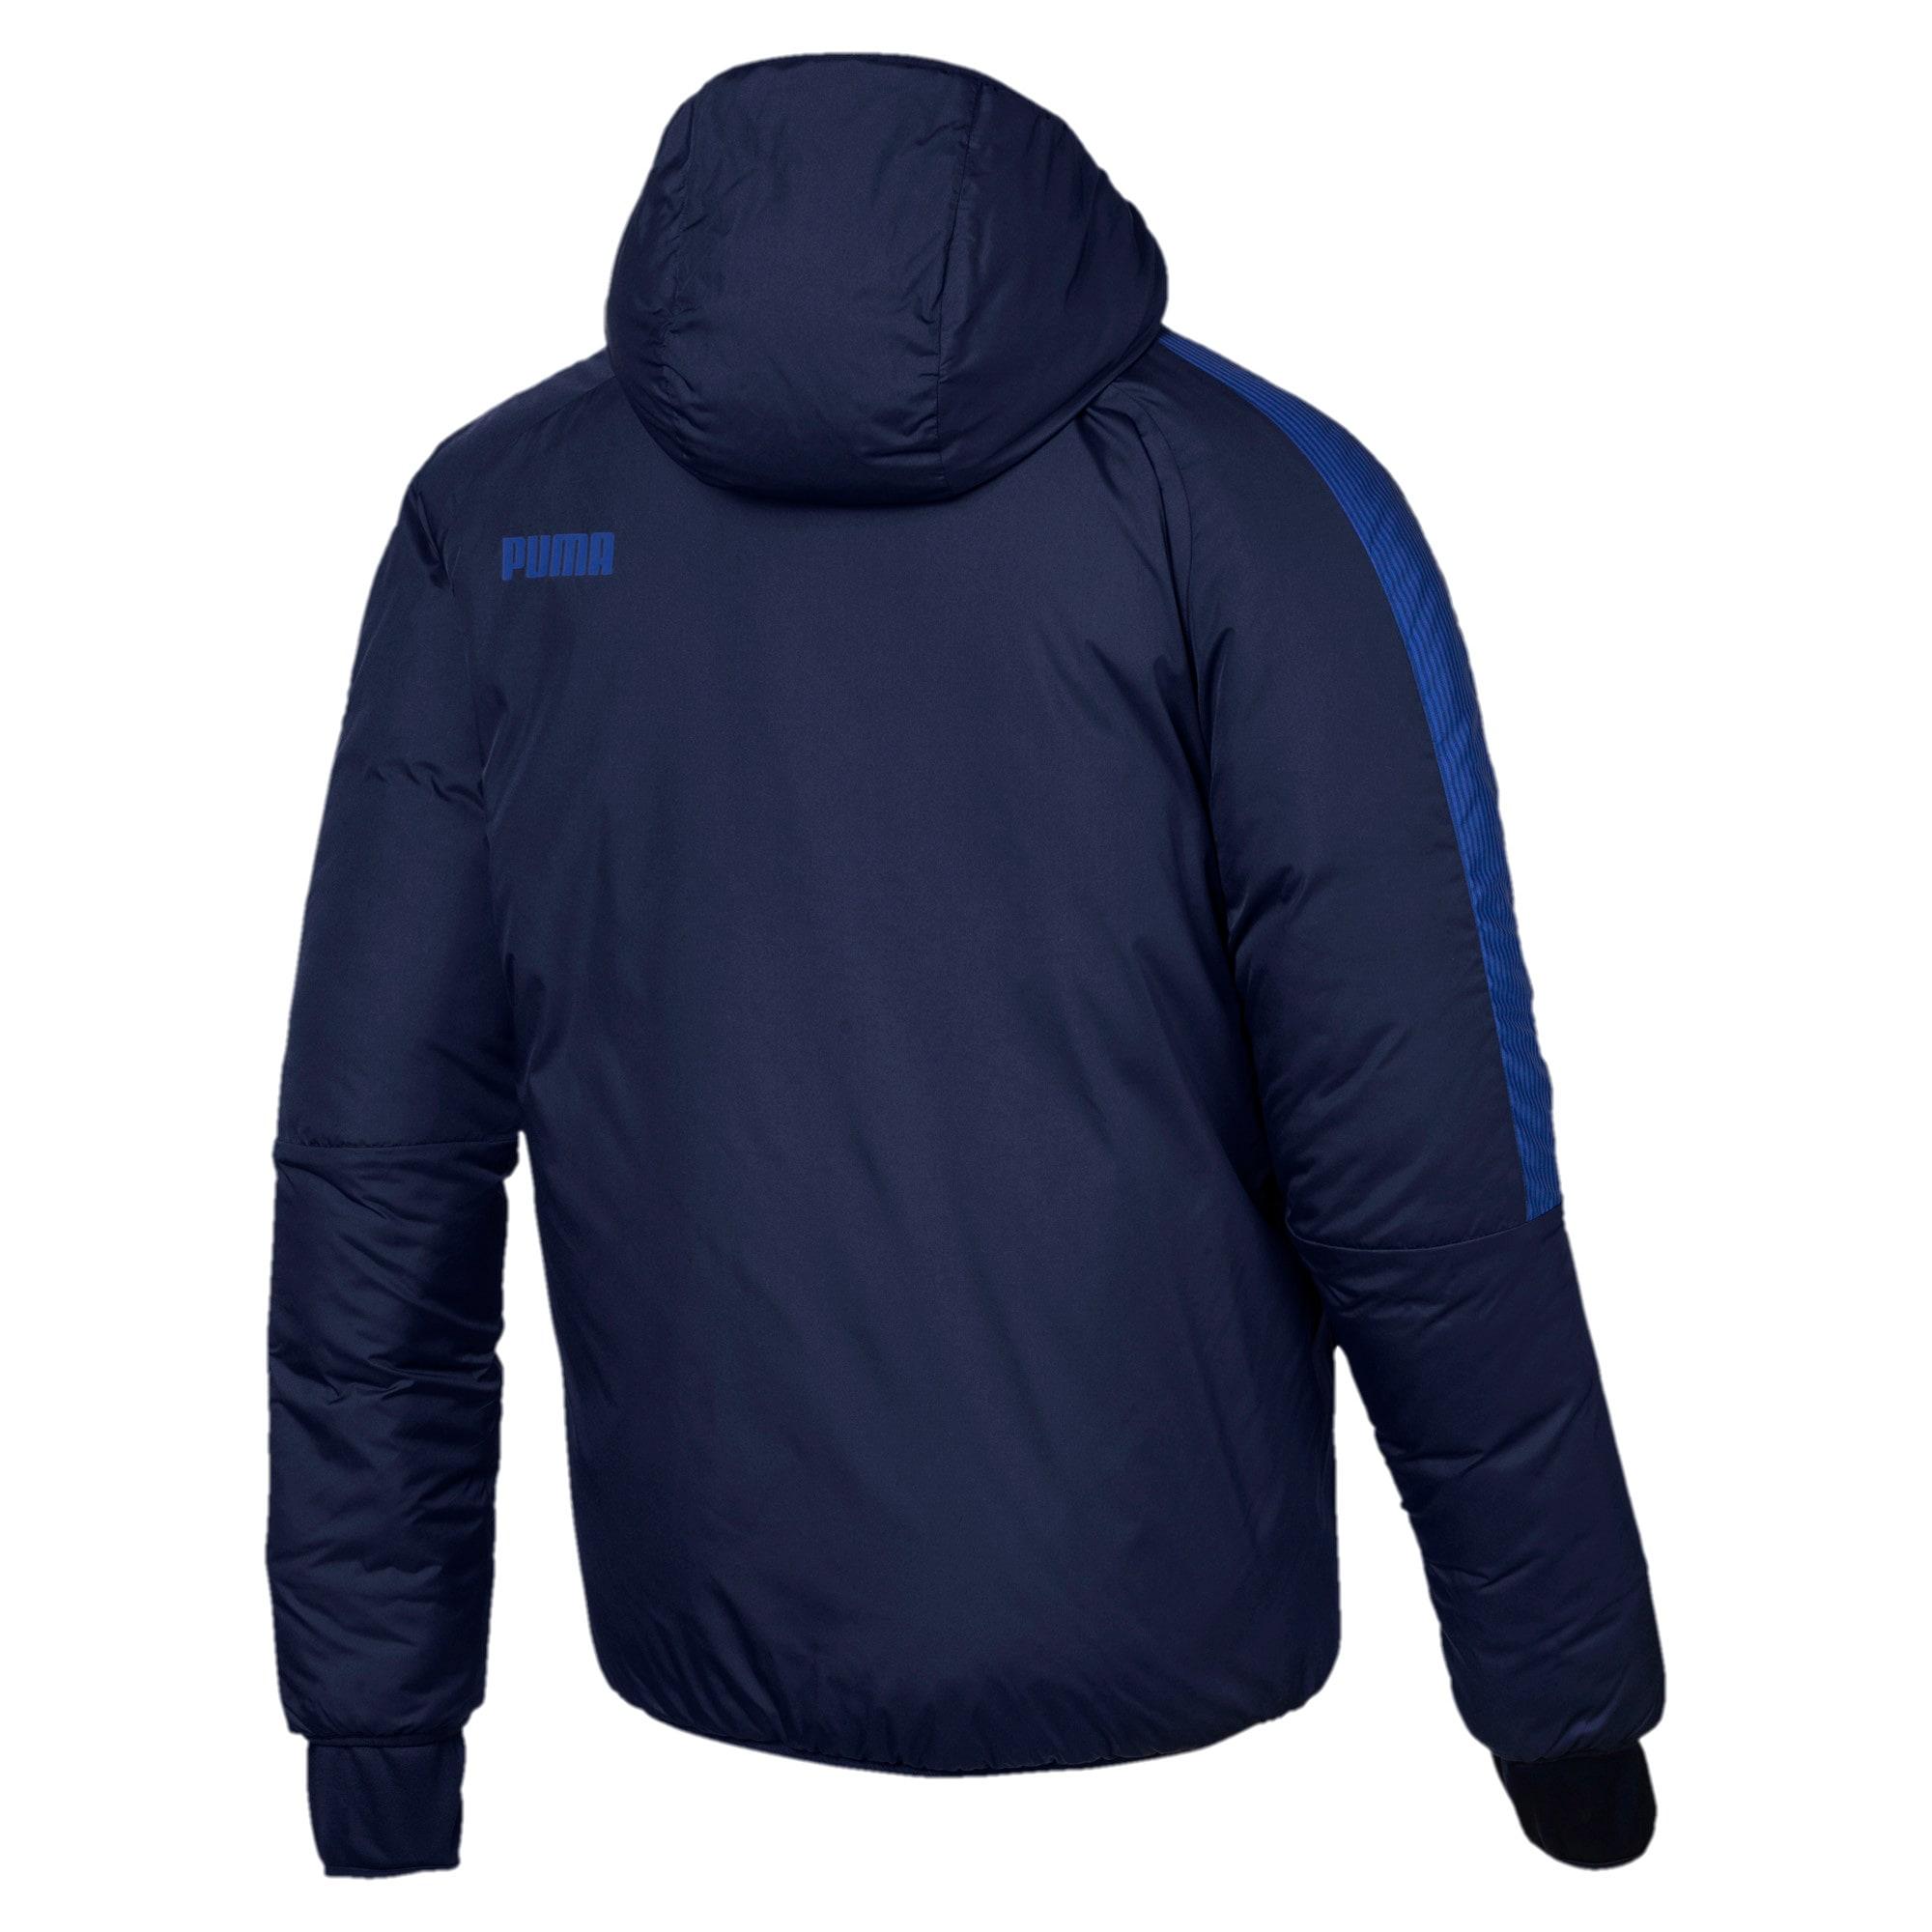 Thumbnail 3 of PWRWarm Men's Jacket, Peacoat, medium